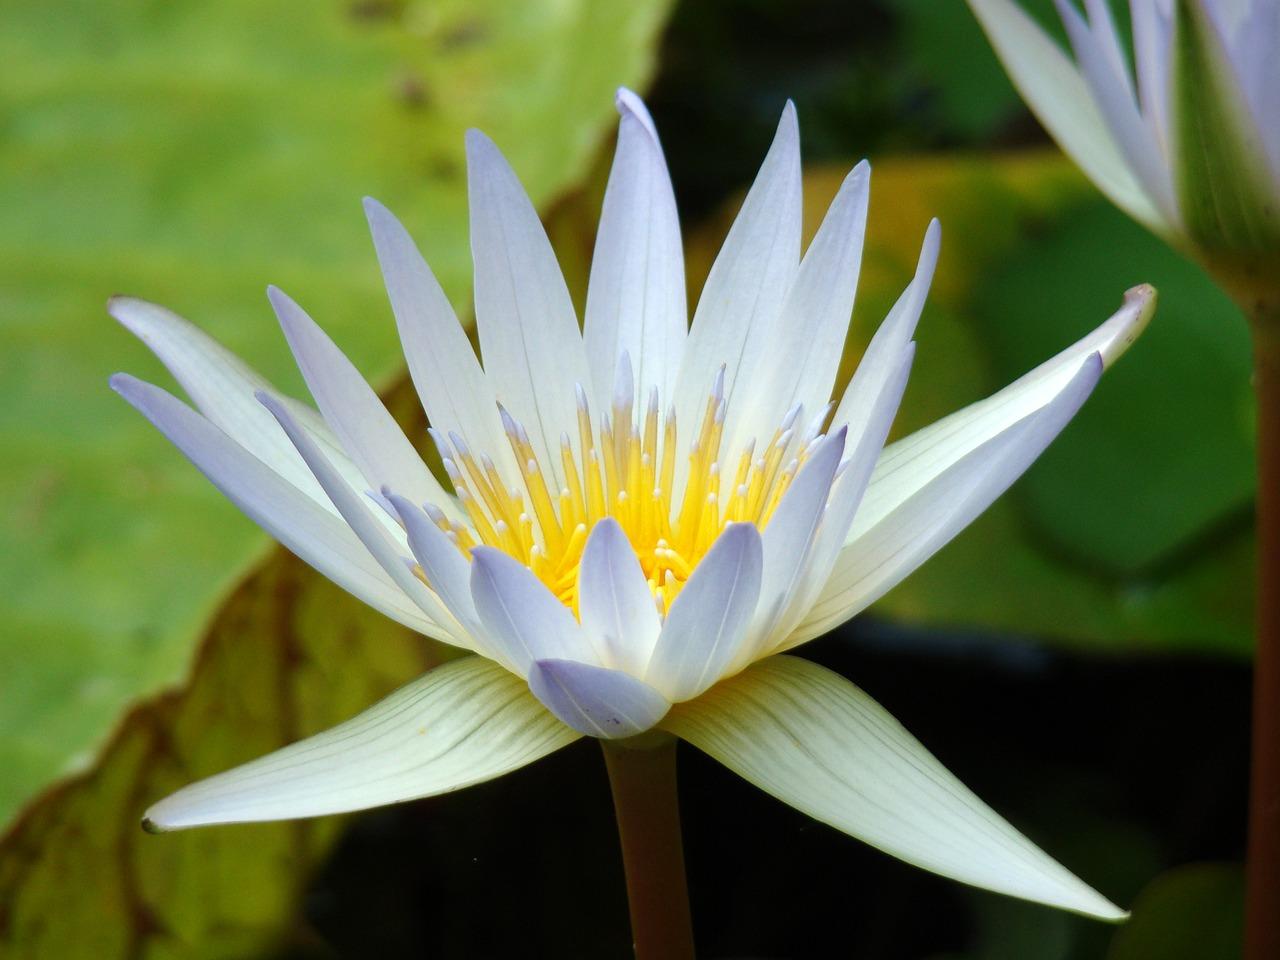 Lilyflowerlilieswater Lilyplant Free Photo From Needpix